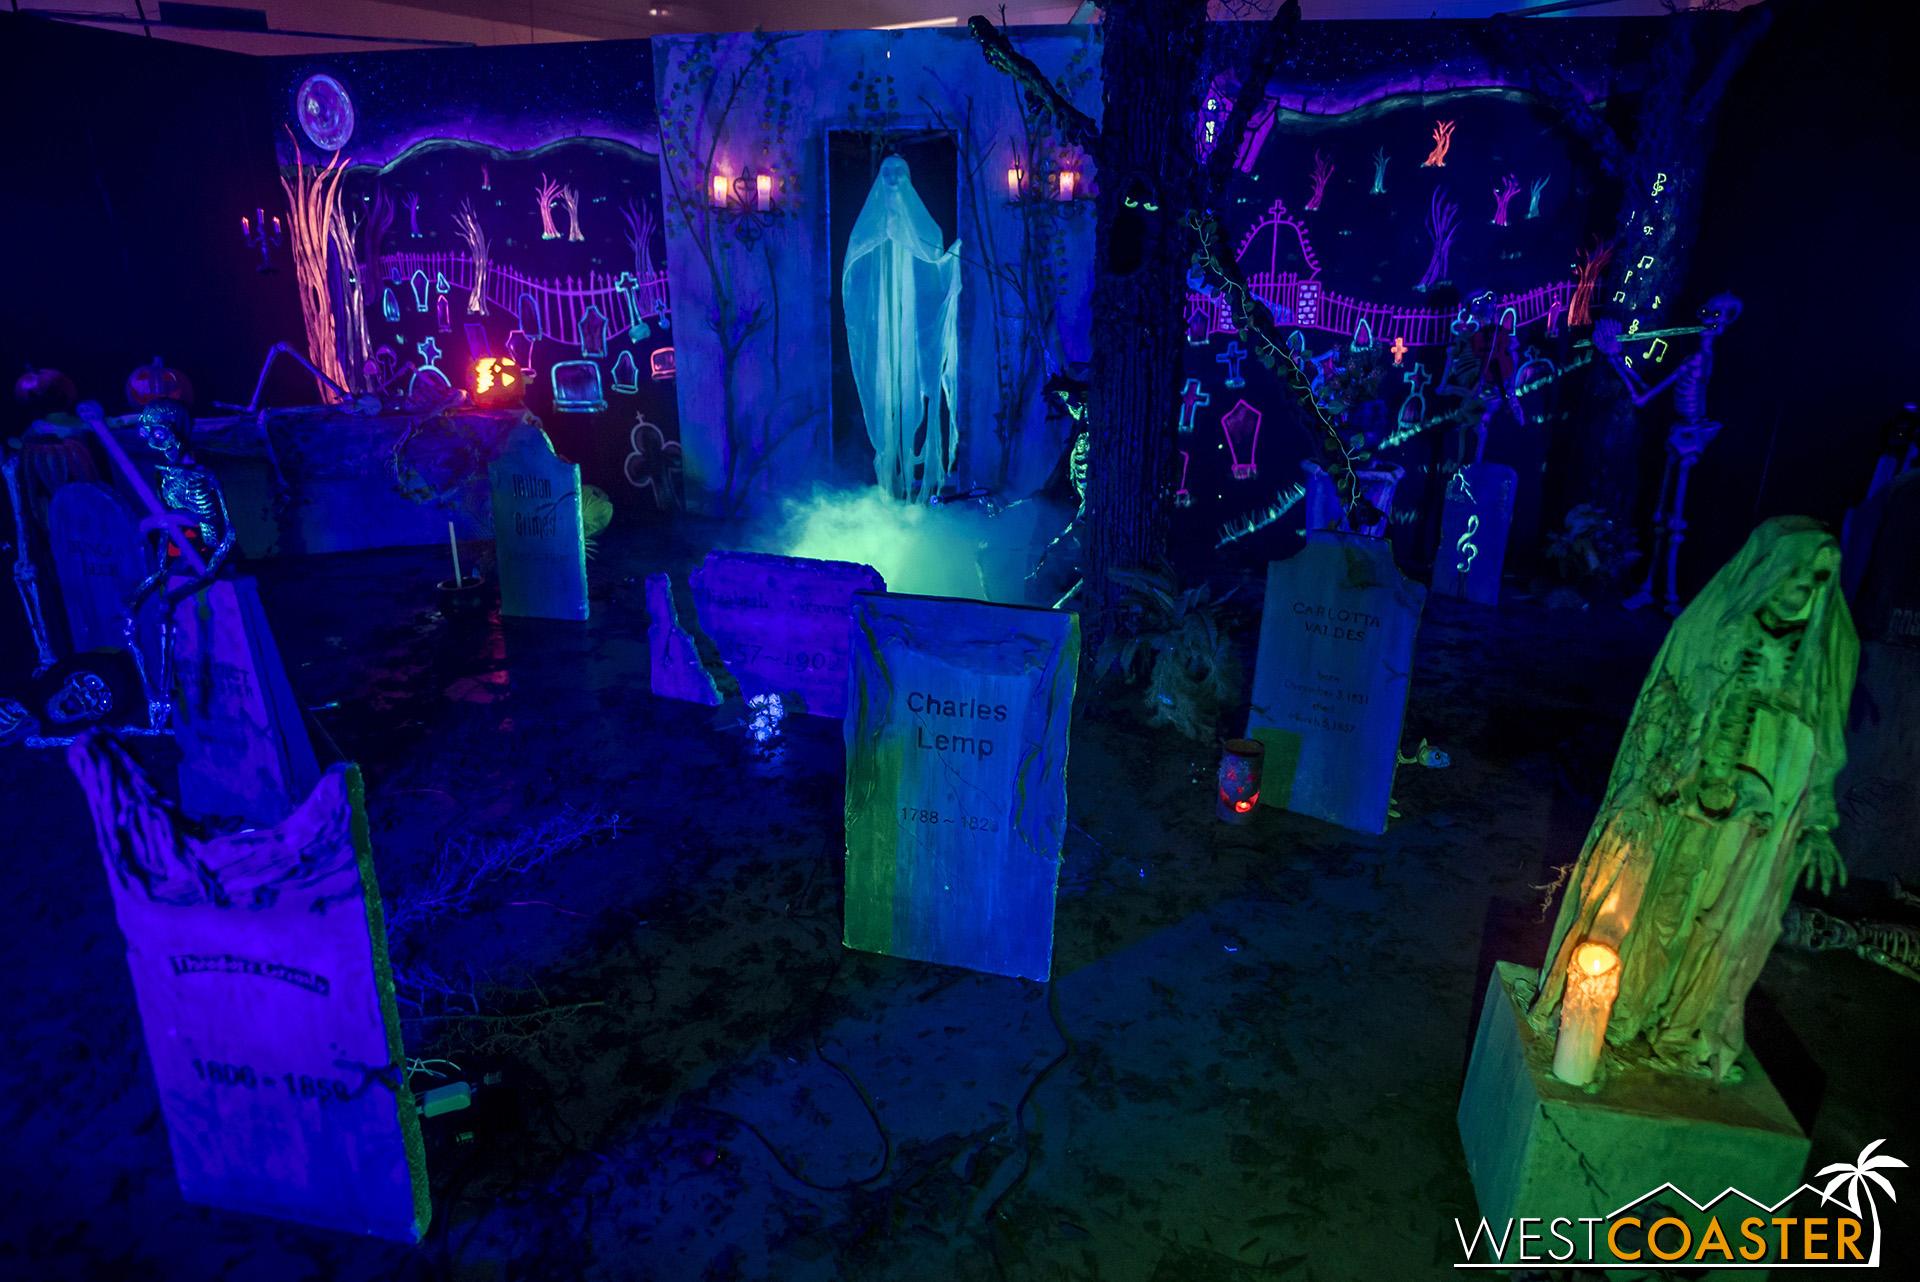 MSS-19_0809-02-RosehillHaunt-CemeteryCelebration-0005.jpg